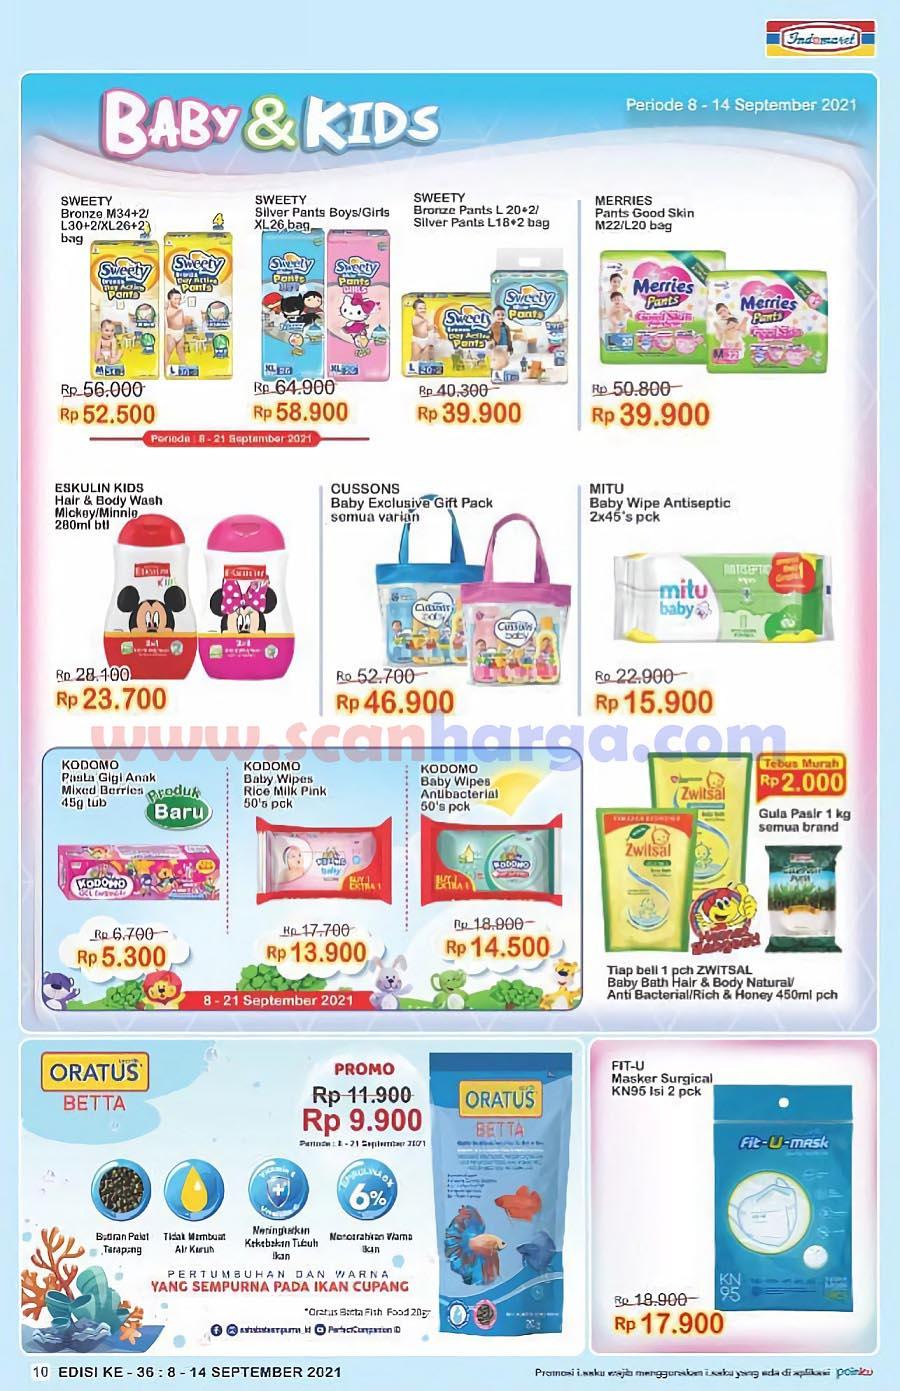 Katalog Indomaret Promo Terbaru 8 - 14 September 2021 10